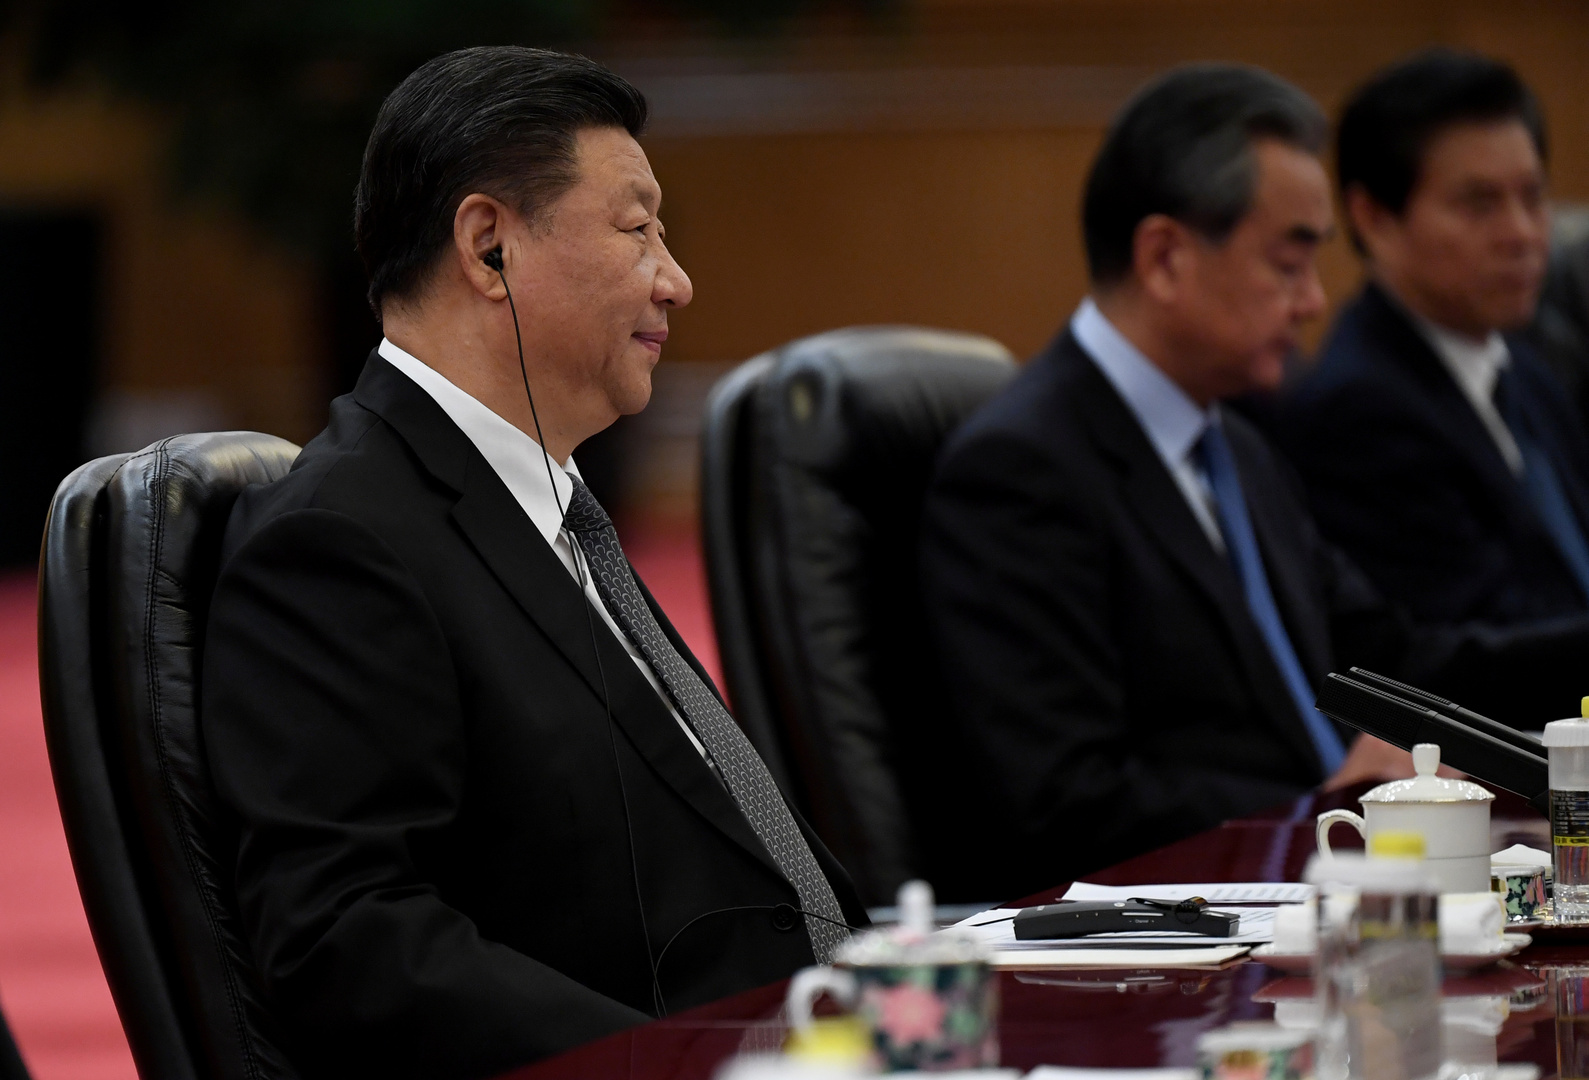 شي جين بينغ يتعهد بدعم زعيمة هونغ كونغ